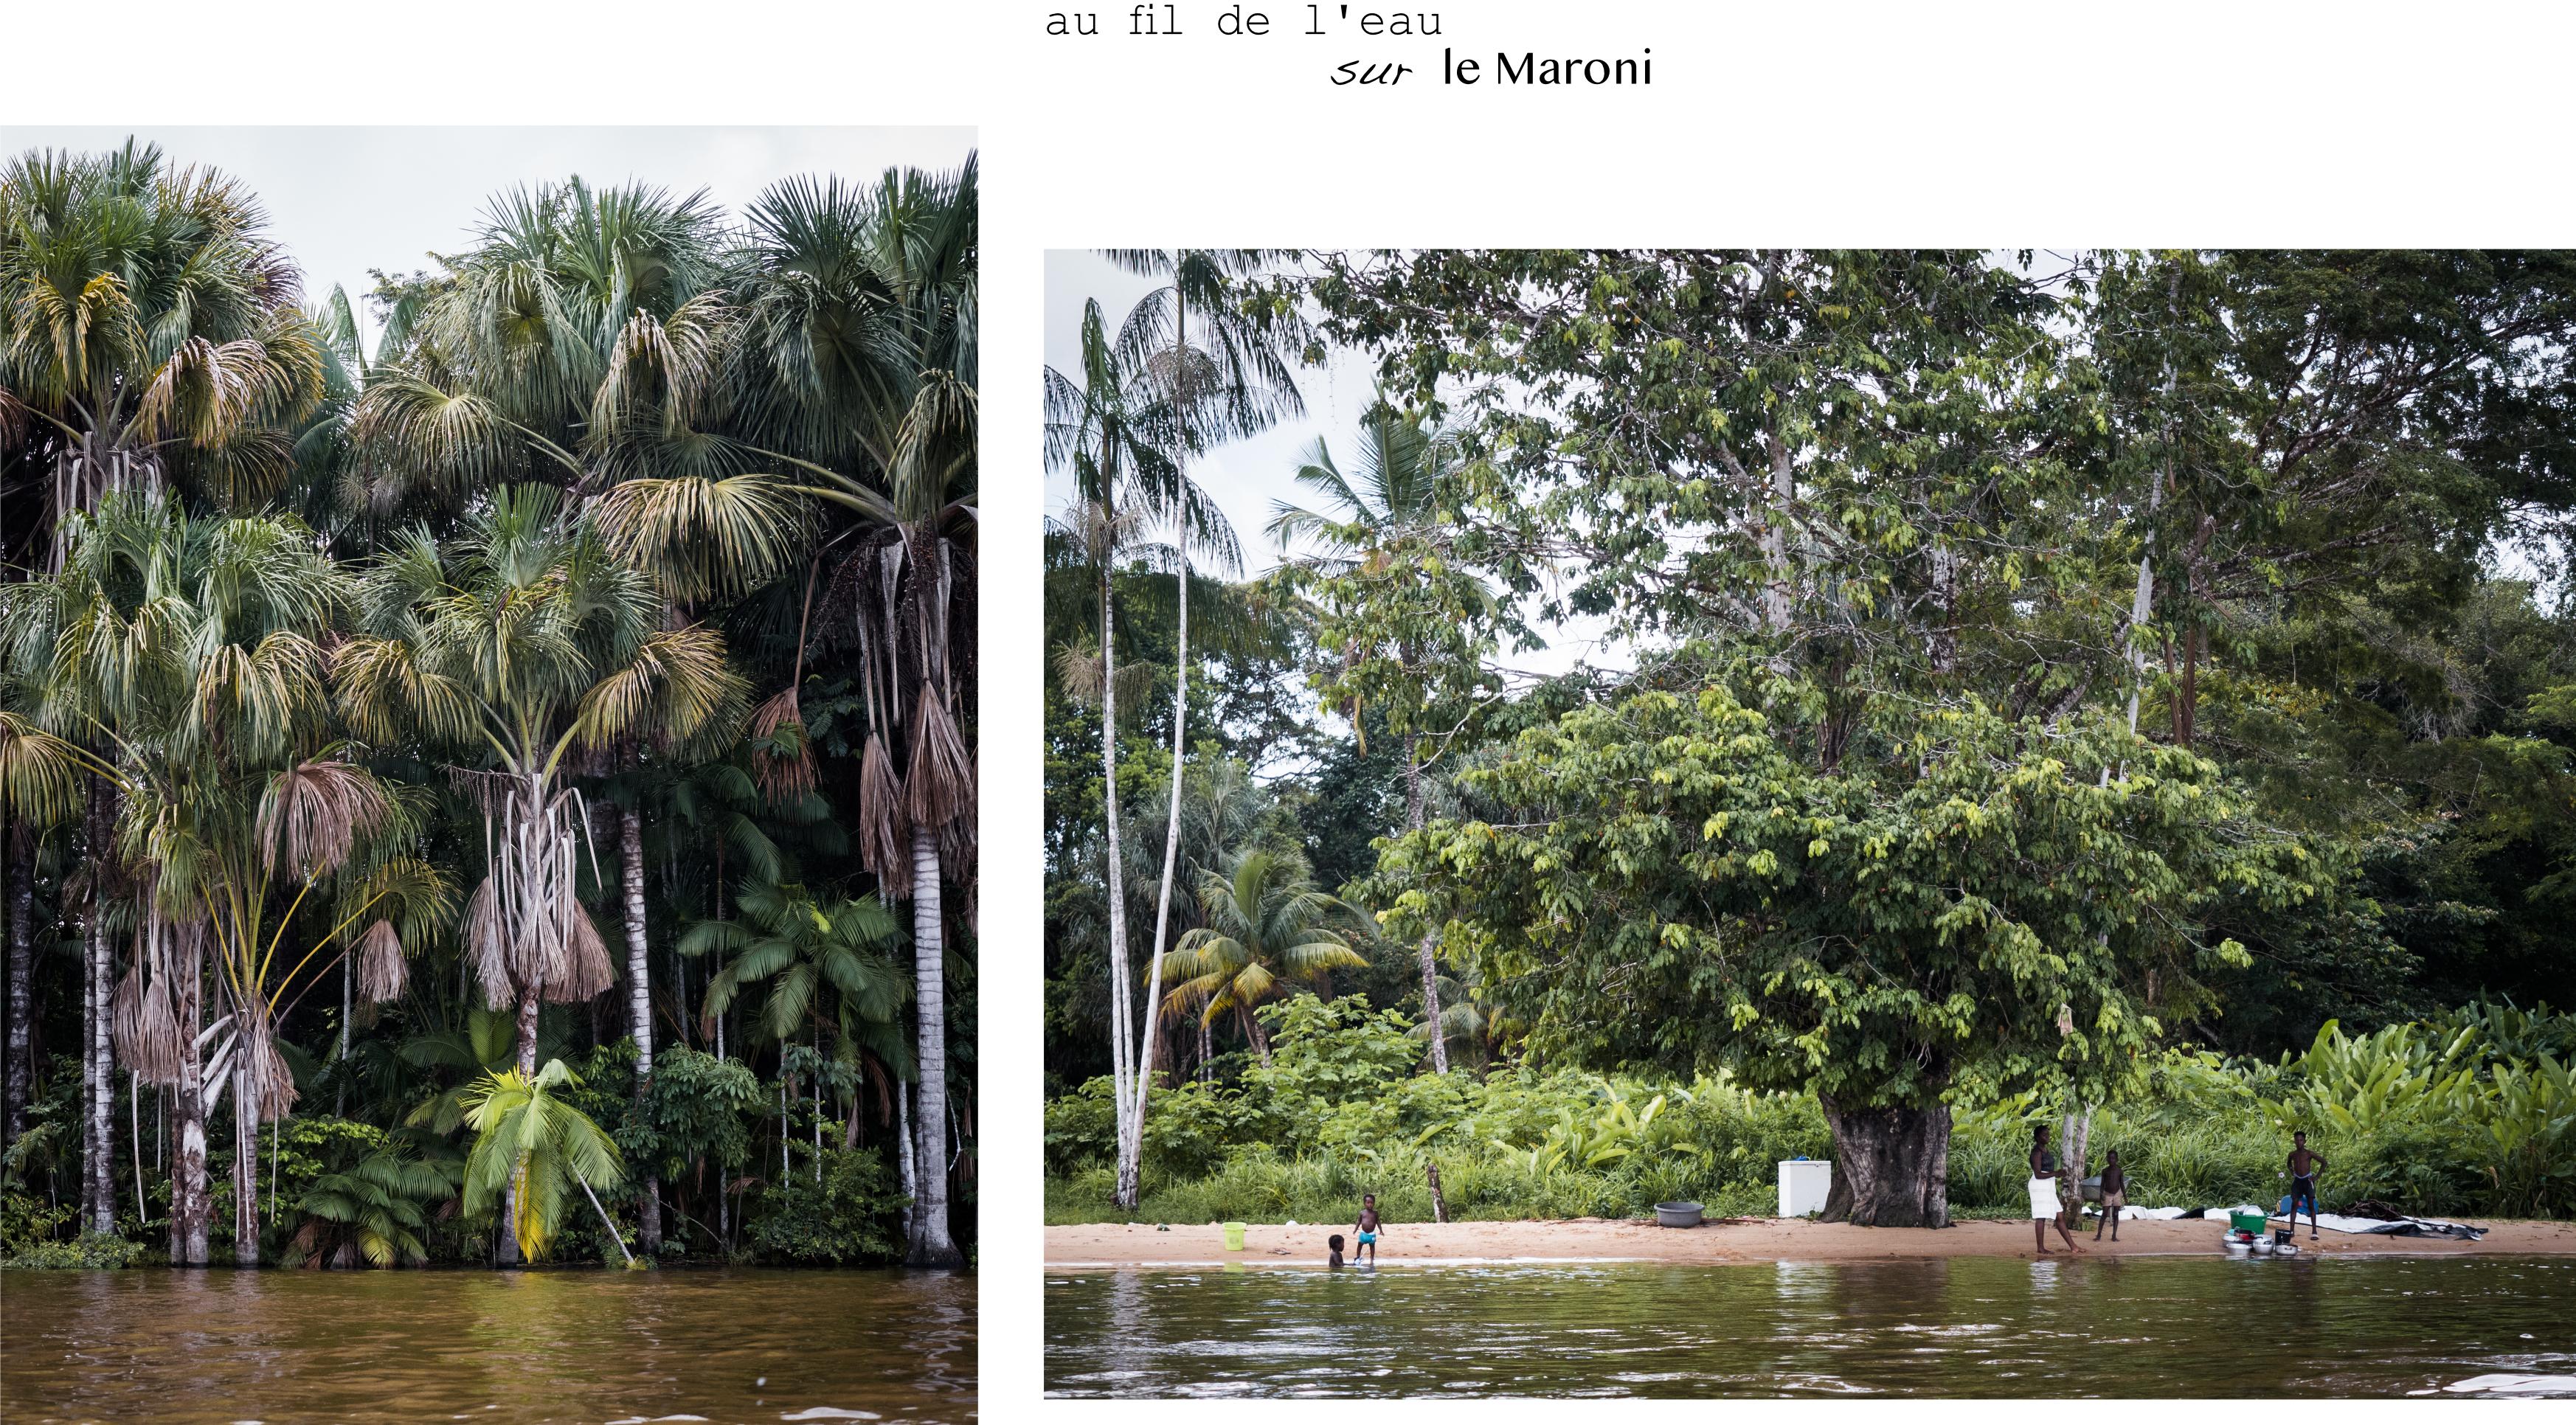 guyane Amazonie - rive du maroni - fleuve st laurent du maroni en pirogue